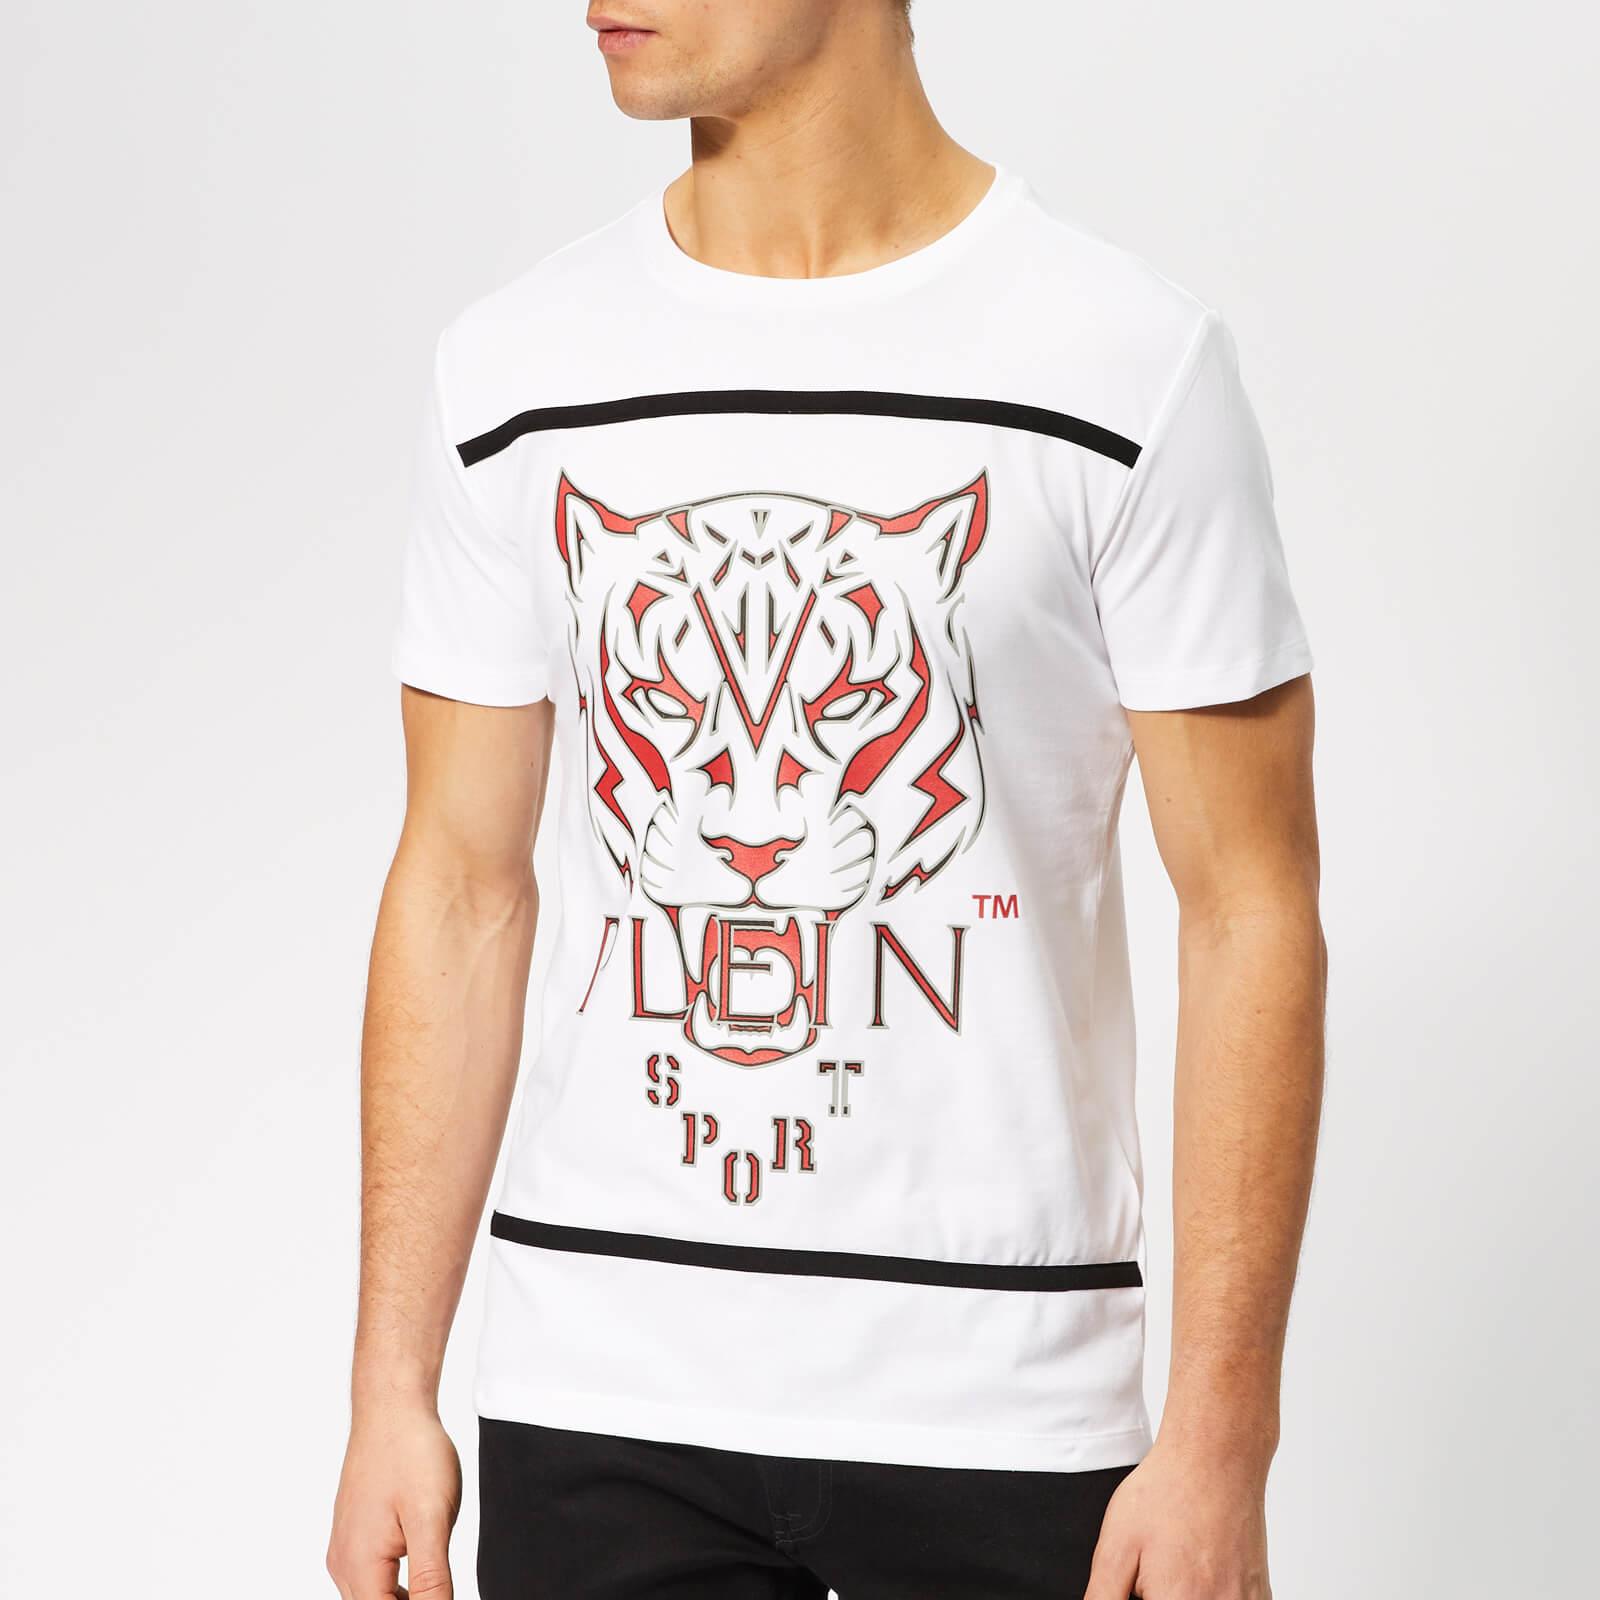 Plein Sport Men's Round Neck Tiger T-Shirt - White/Grey - L - White/Grey